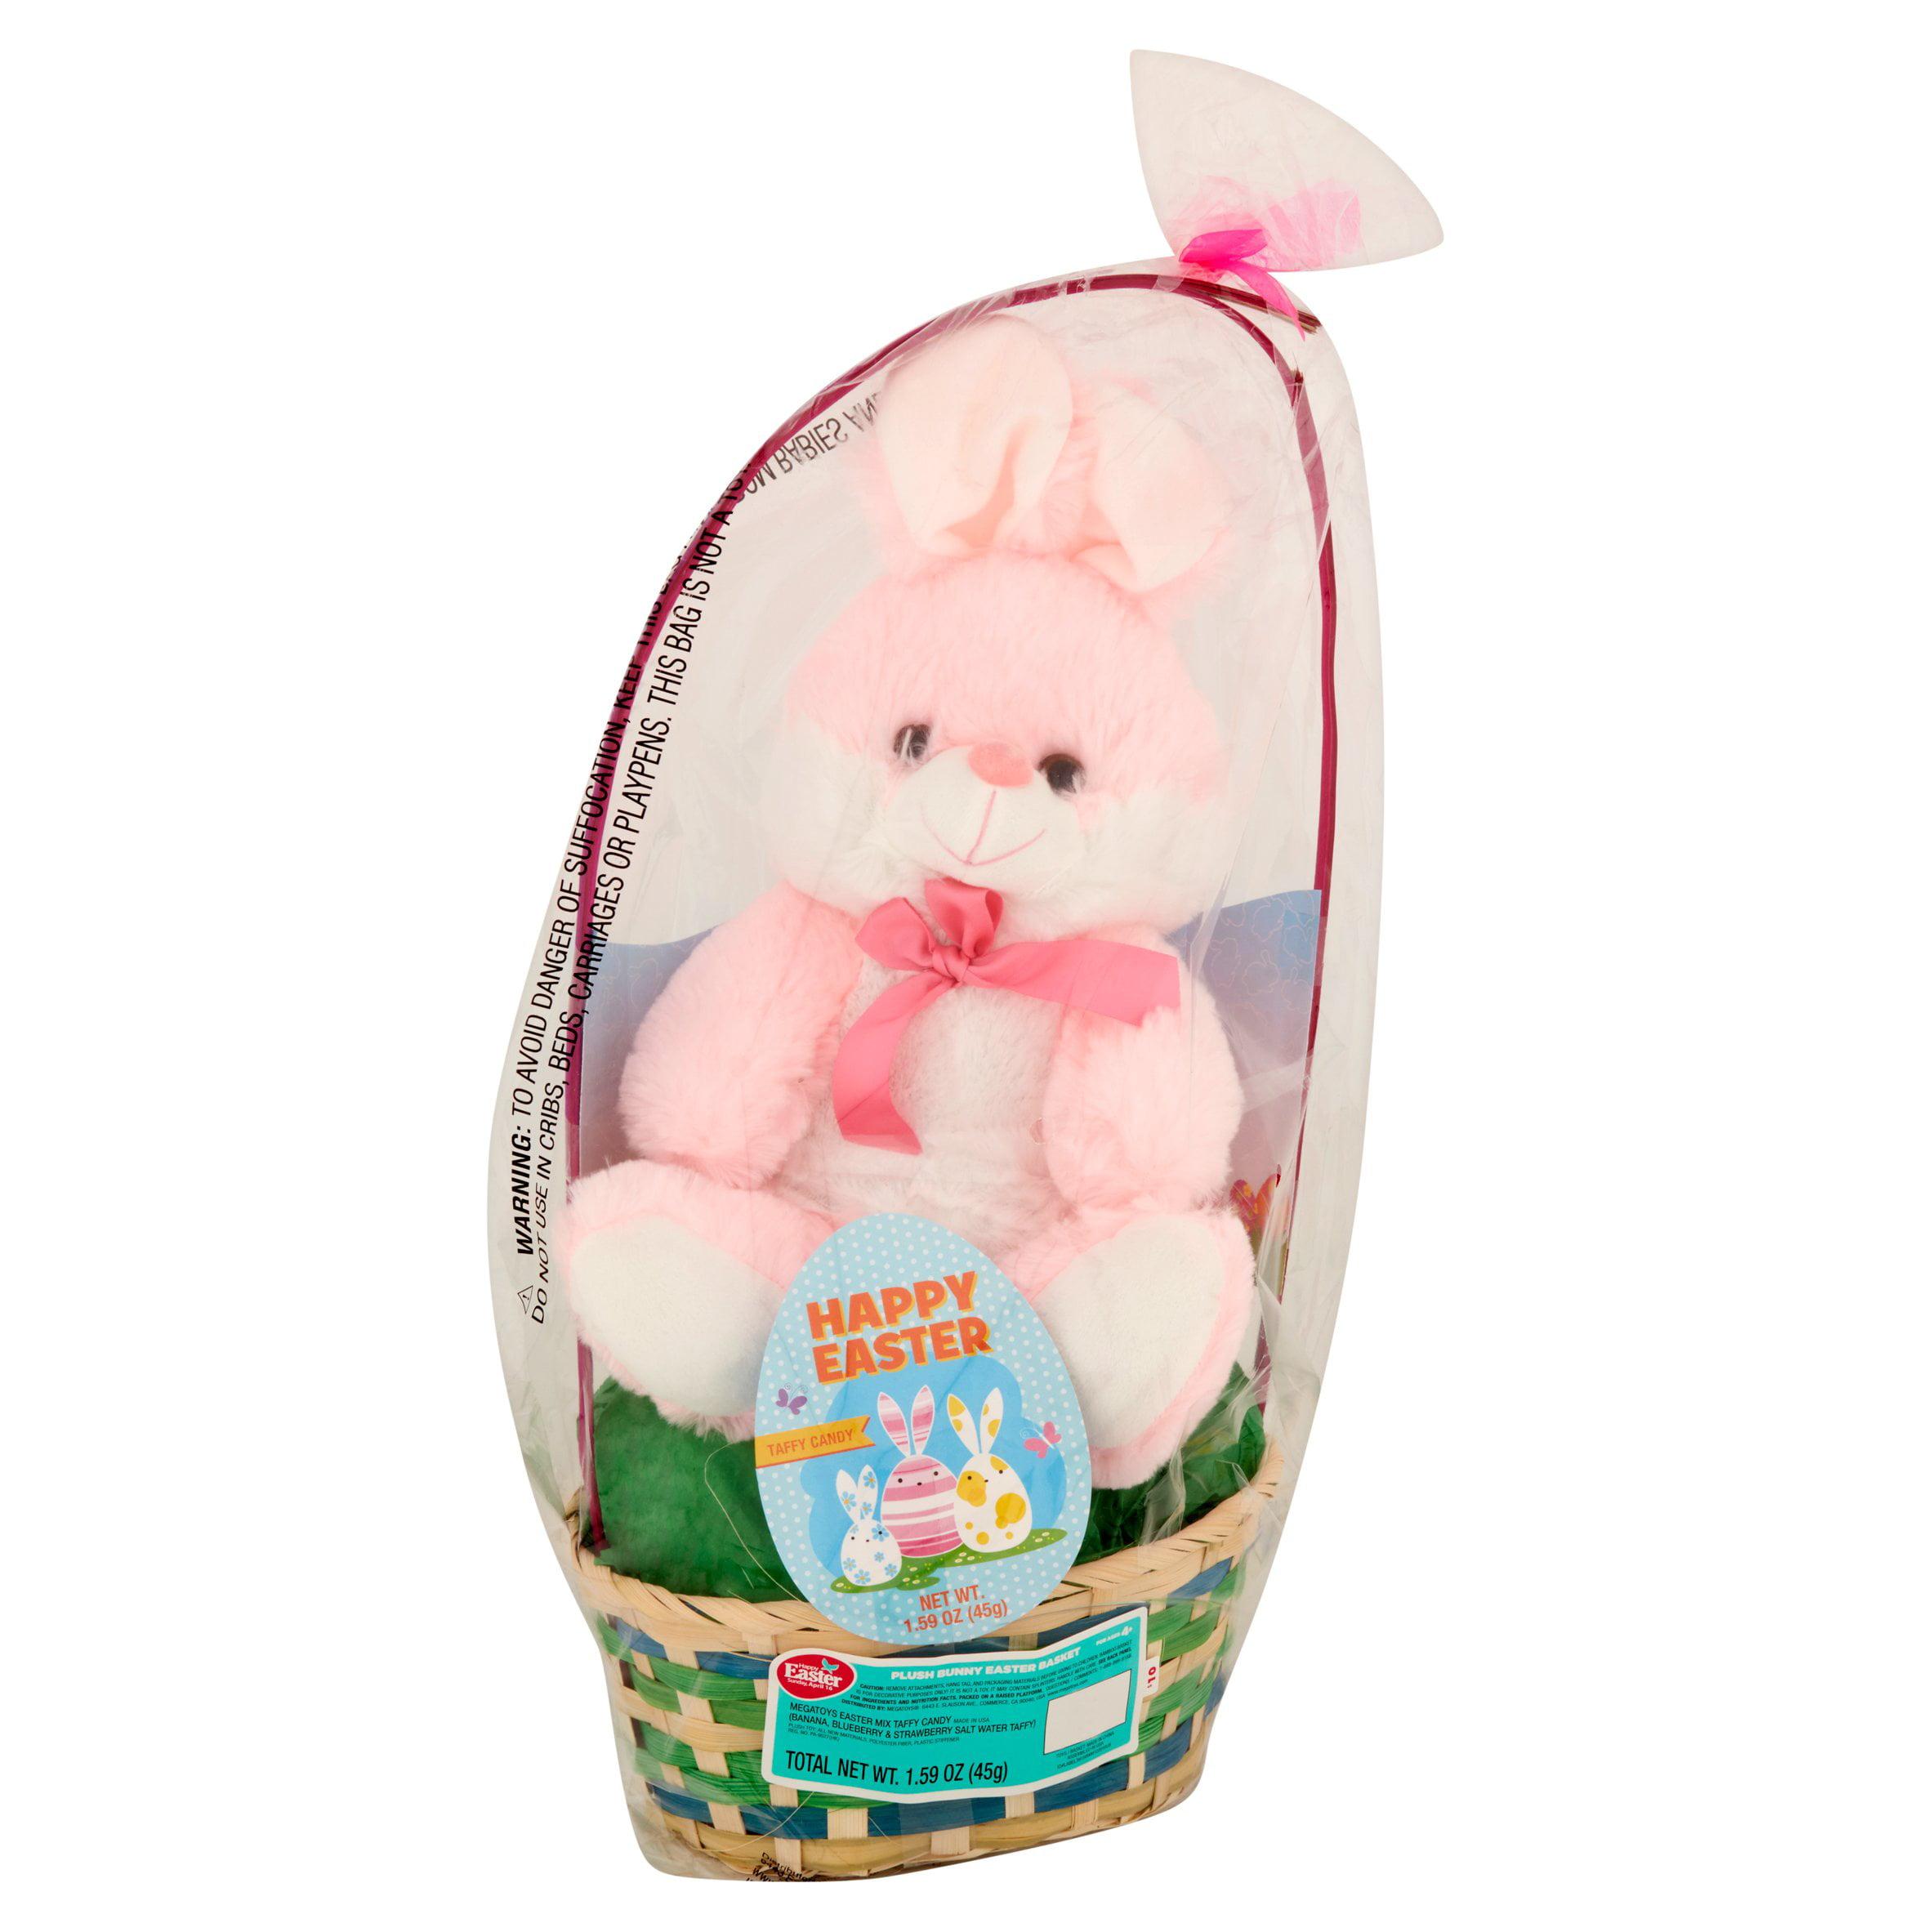 Easter basket with plush animal toy primrose taffy item or color easter basket with plush animal toy primrose taffy item or color may vary walmart negle Choice Image